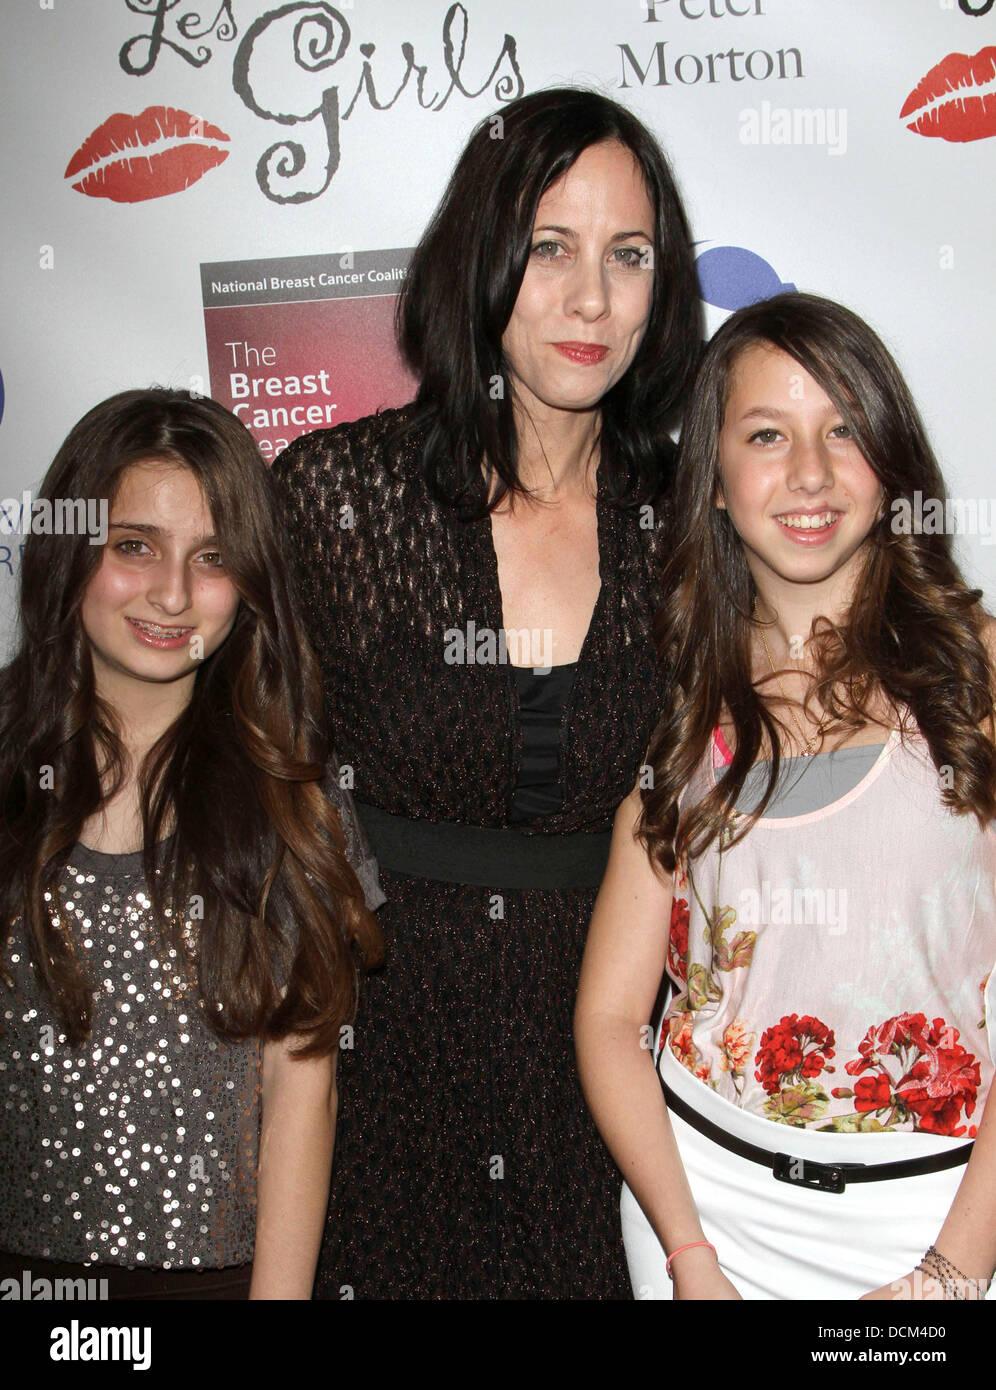 Kendra lust and ariana marie lesbian